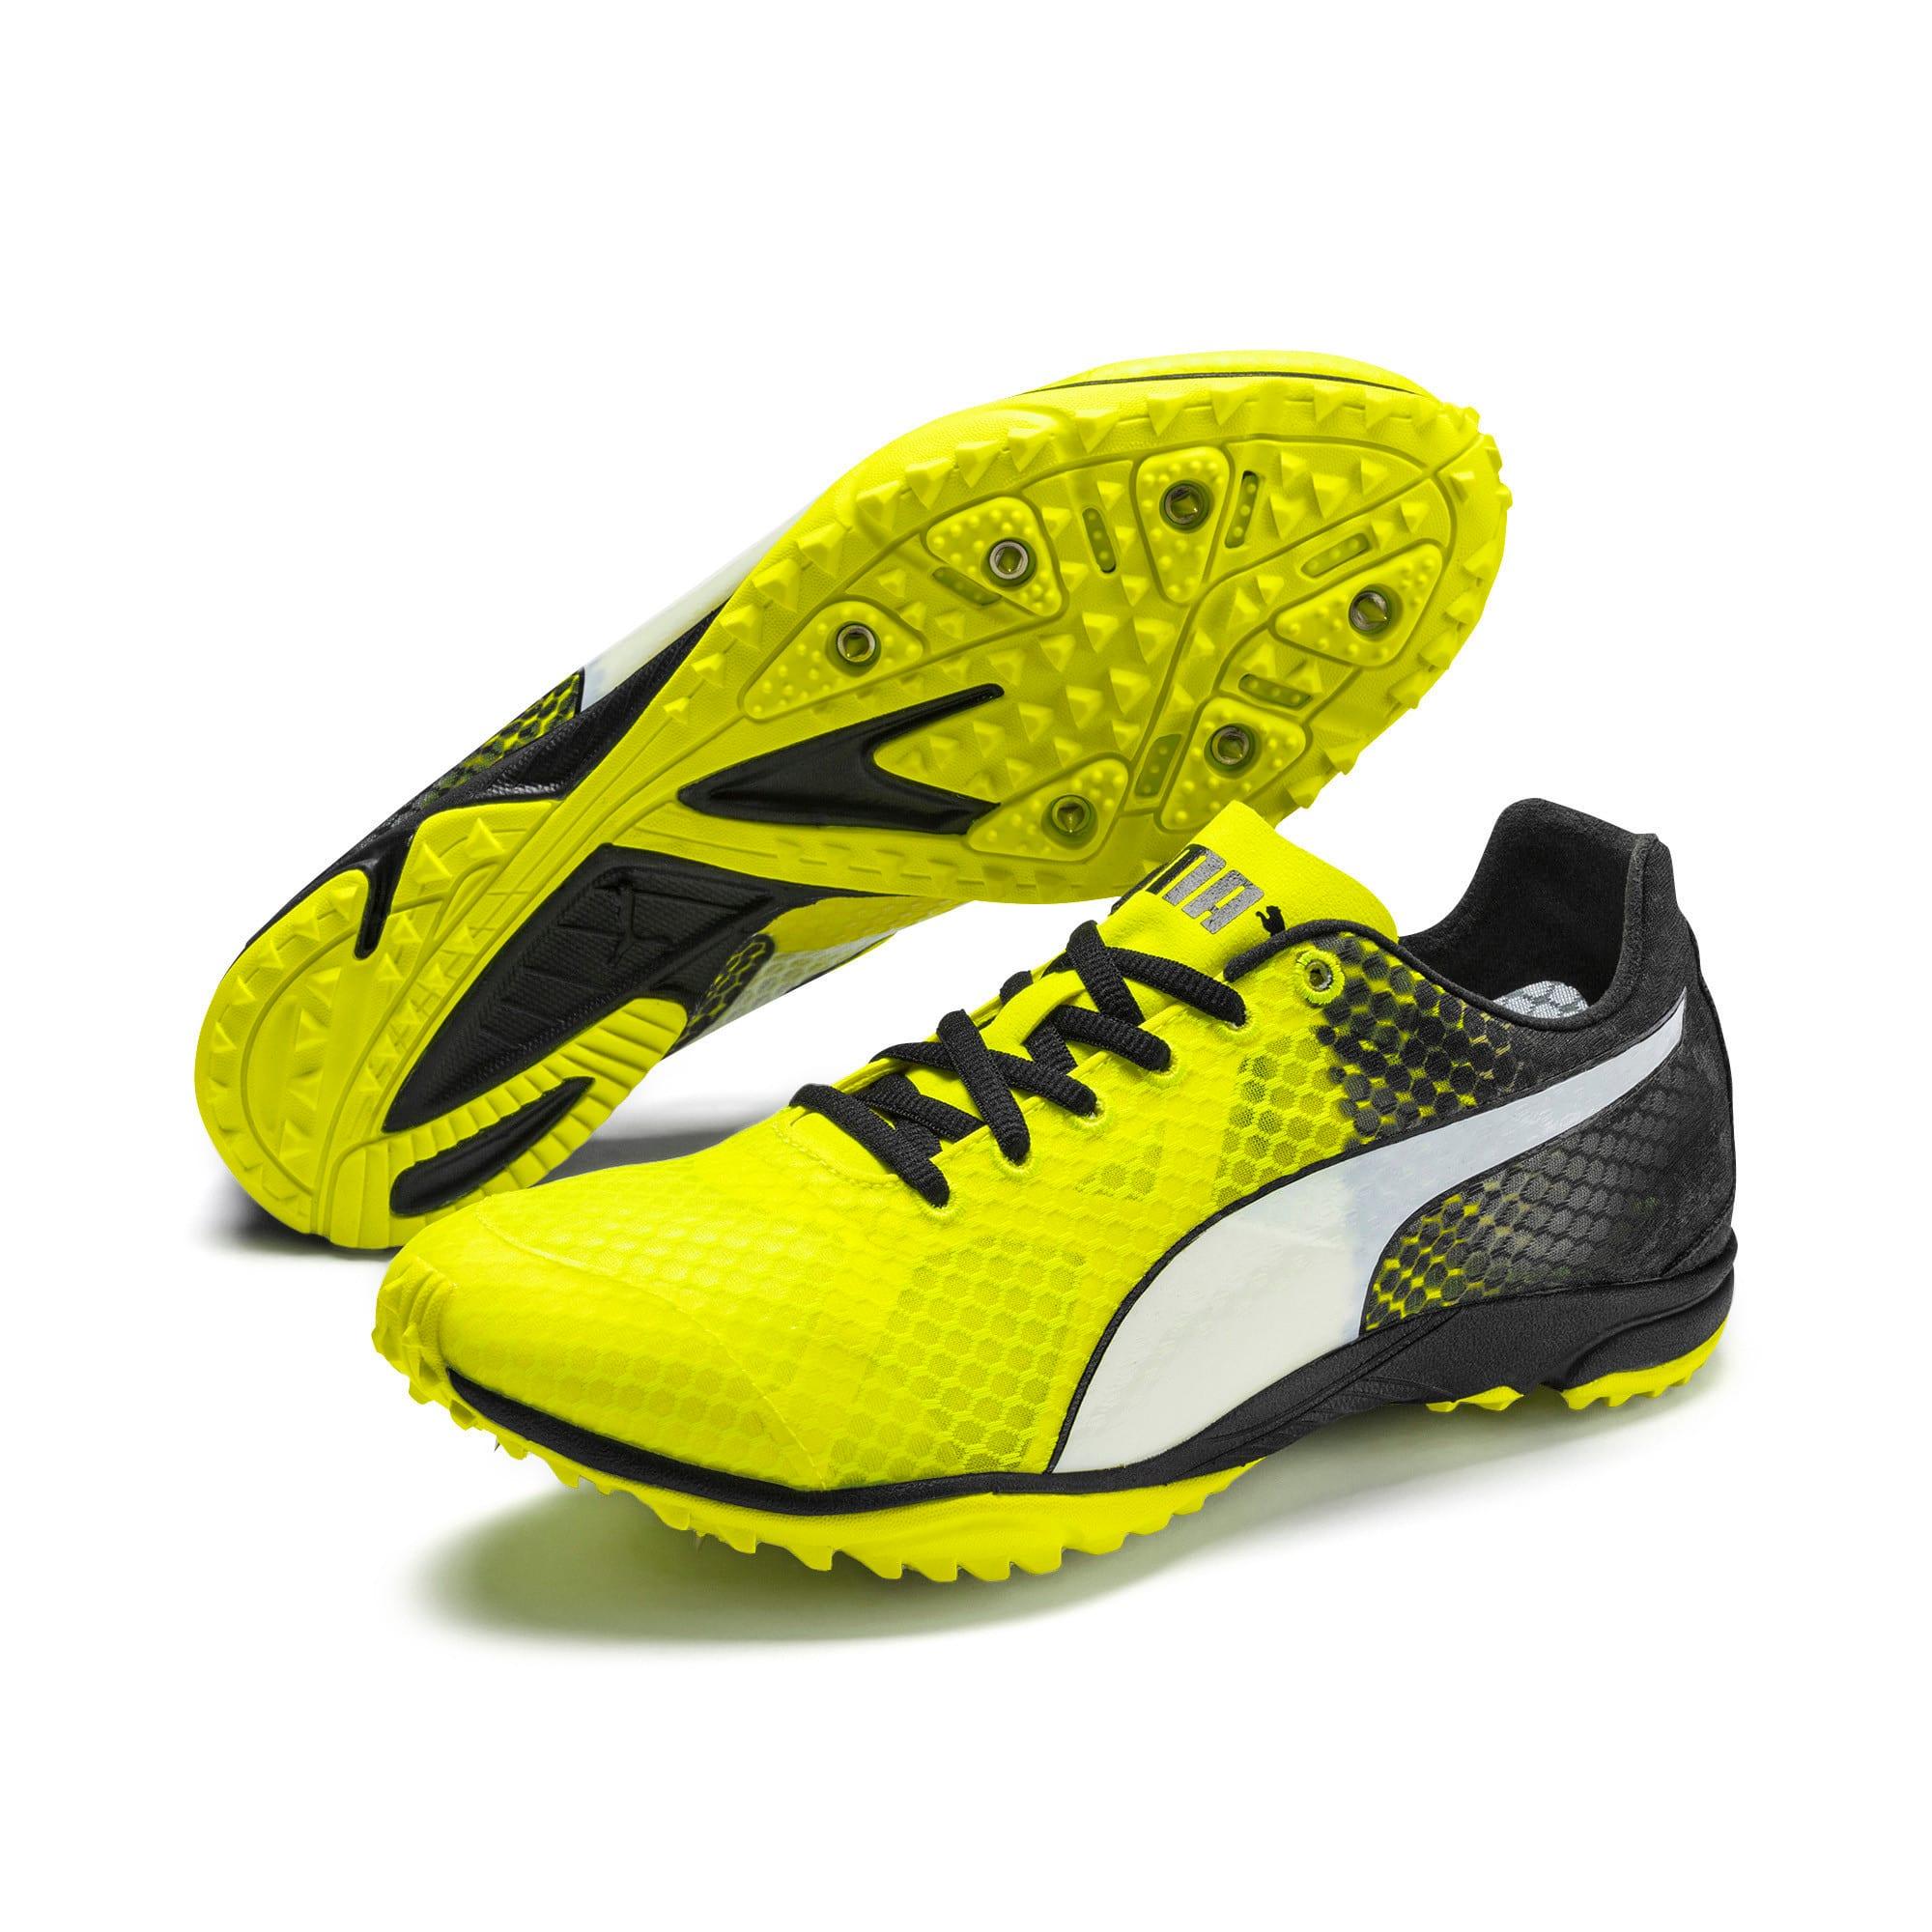 Thumbnail 8 of evoSPEED Haraka 6 Track and Field Boots, Yellow Alert-Black-White, medium-IND